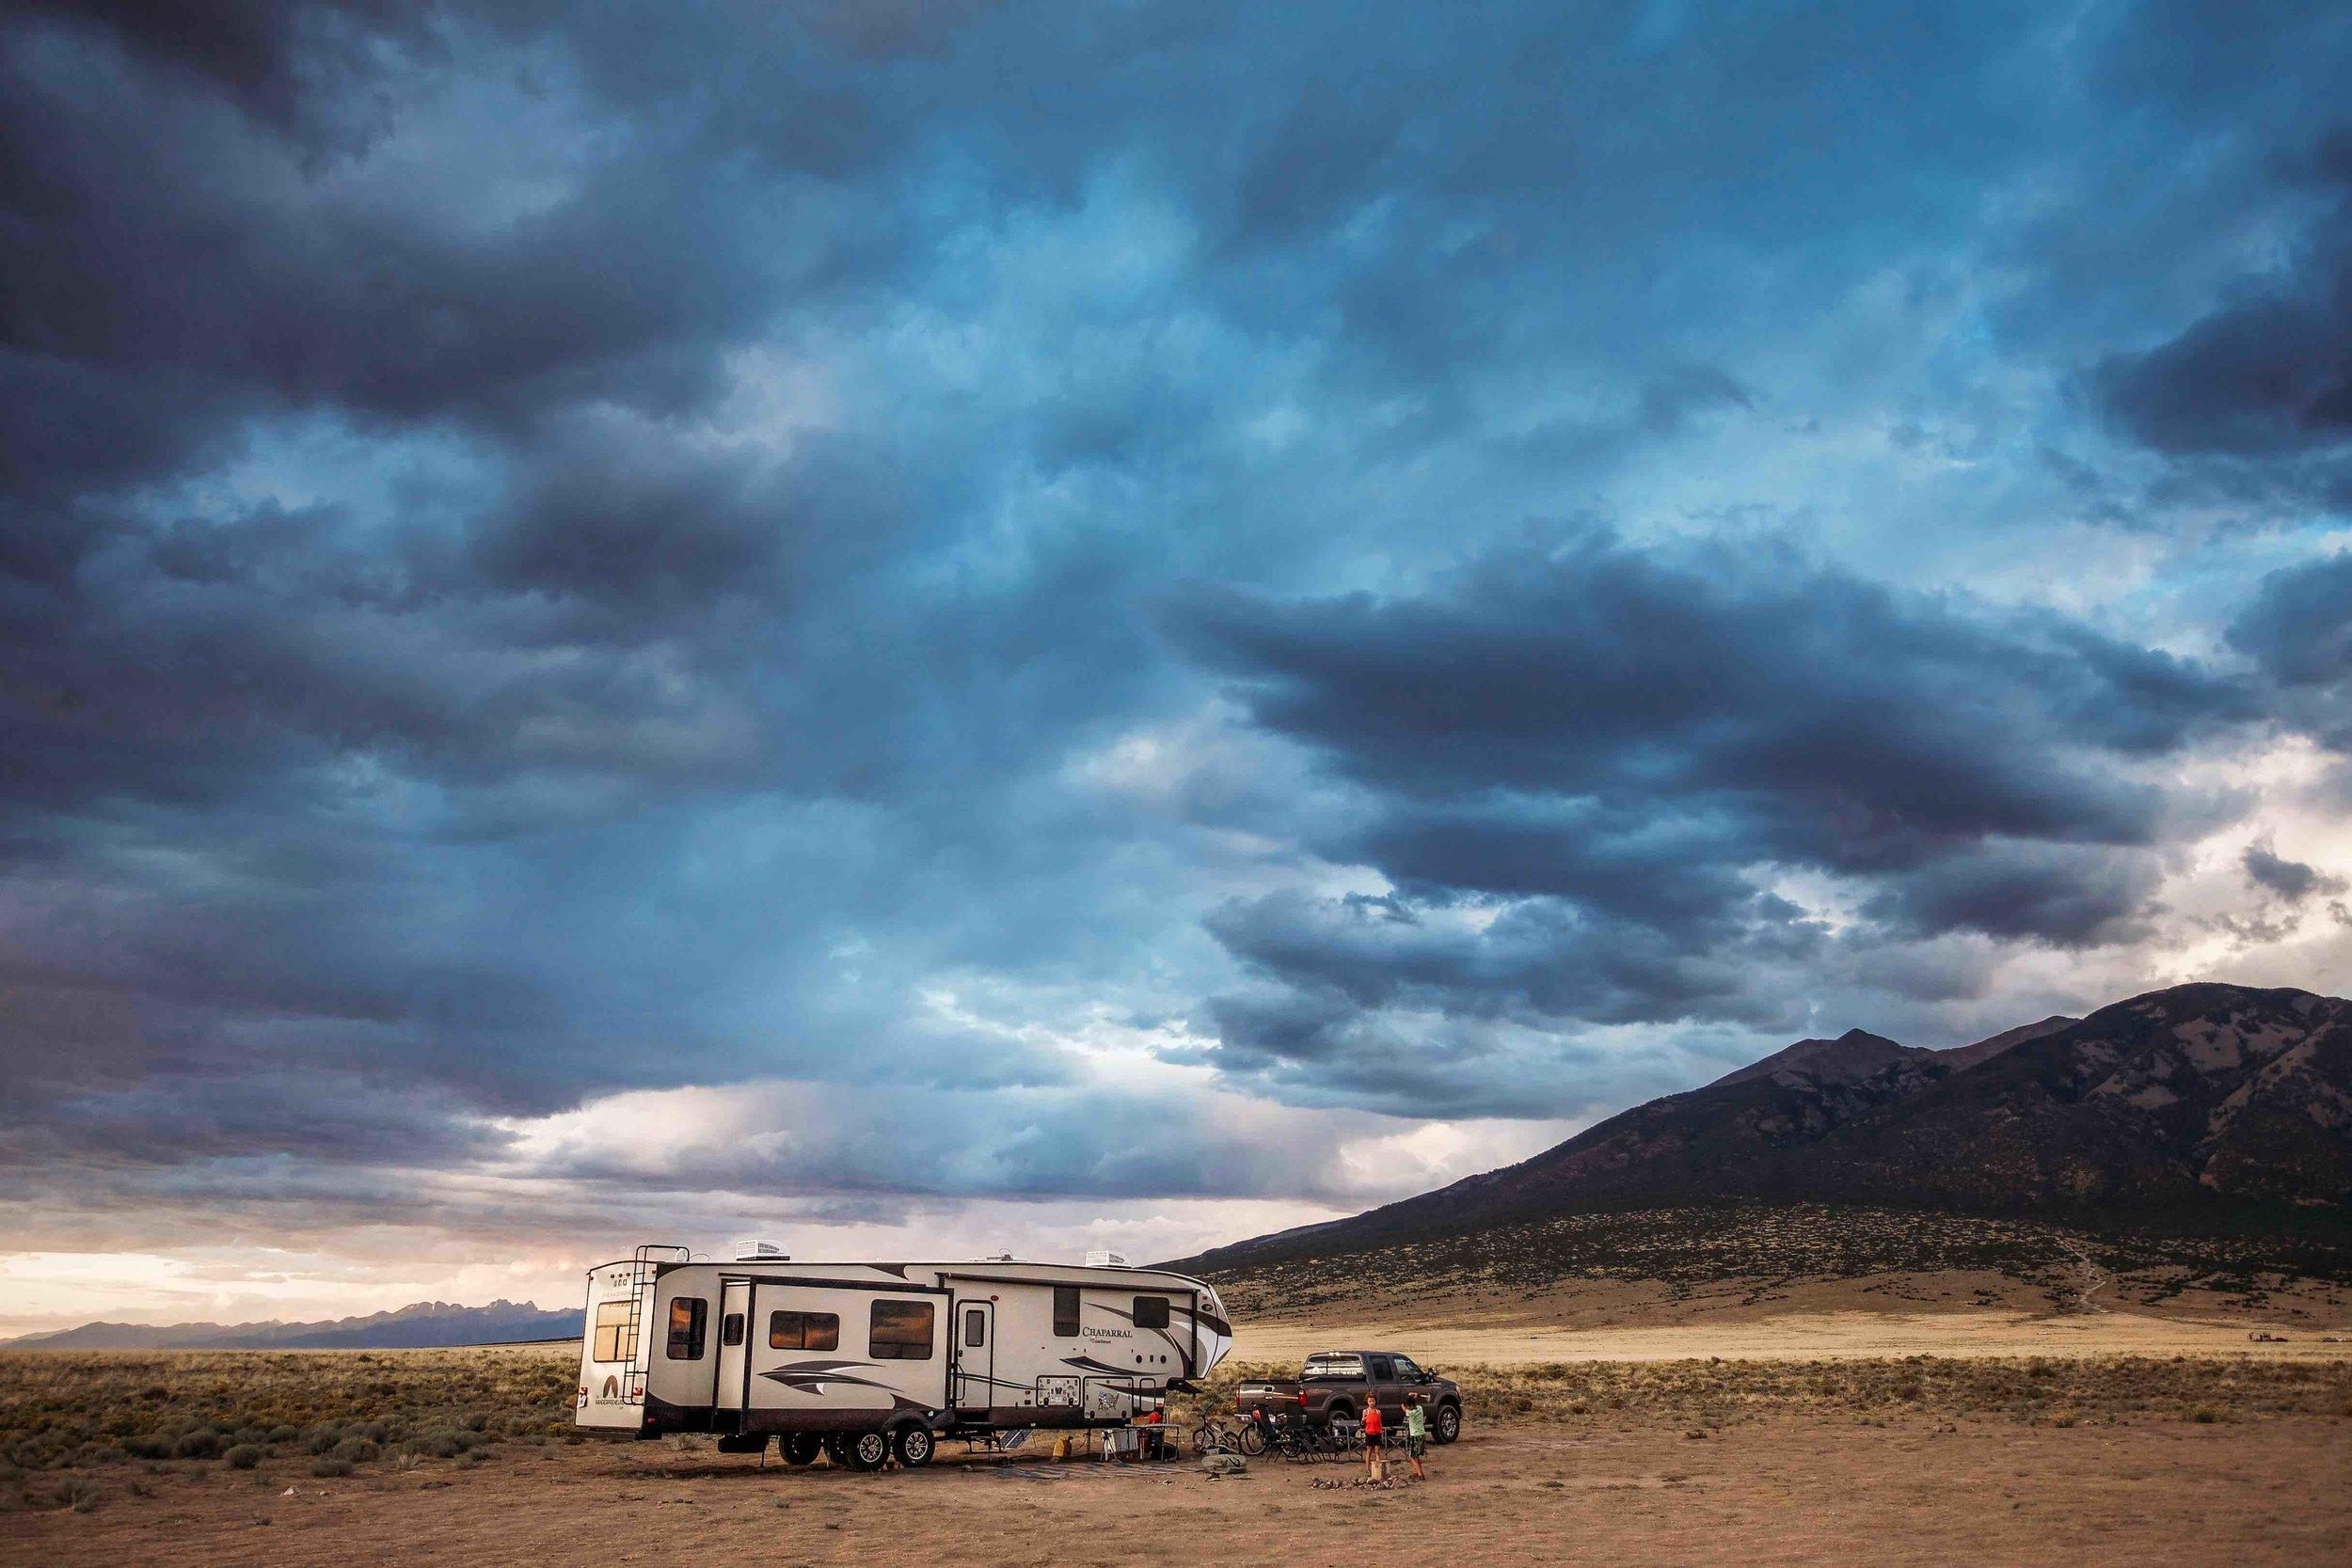 Boondocking near Great Sand Dunes National Park00023.jpeg